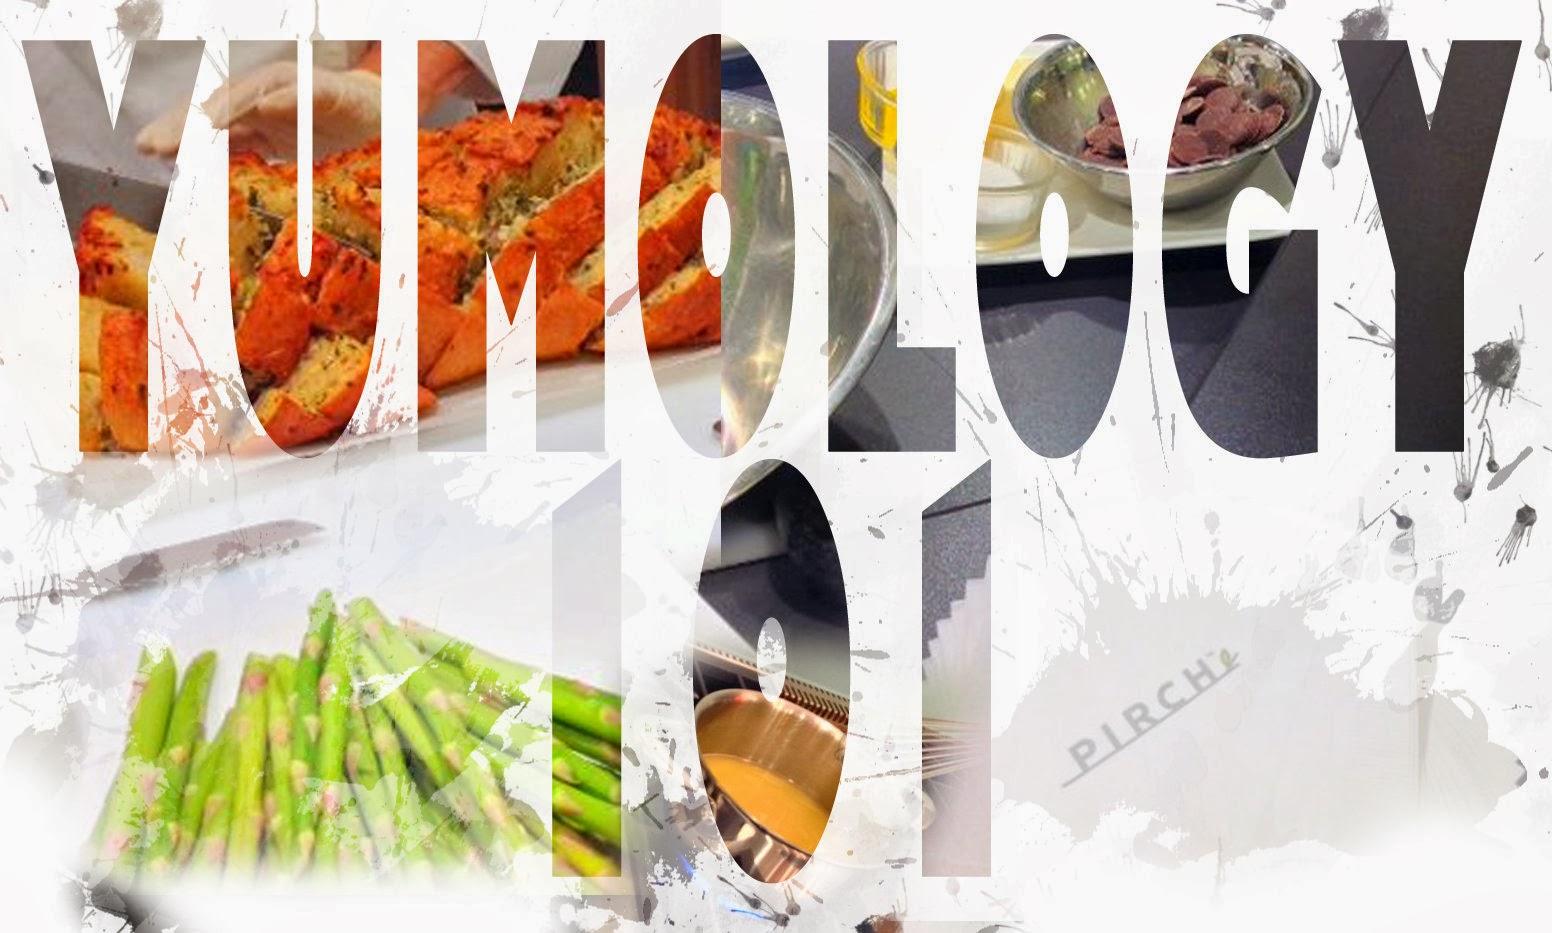 Experiential Luxury, The Pirch, Yumology 101, San Diego, La Jolla